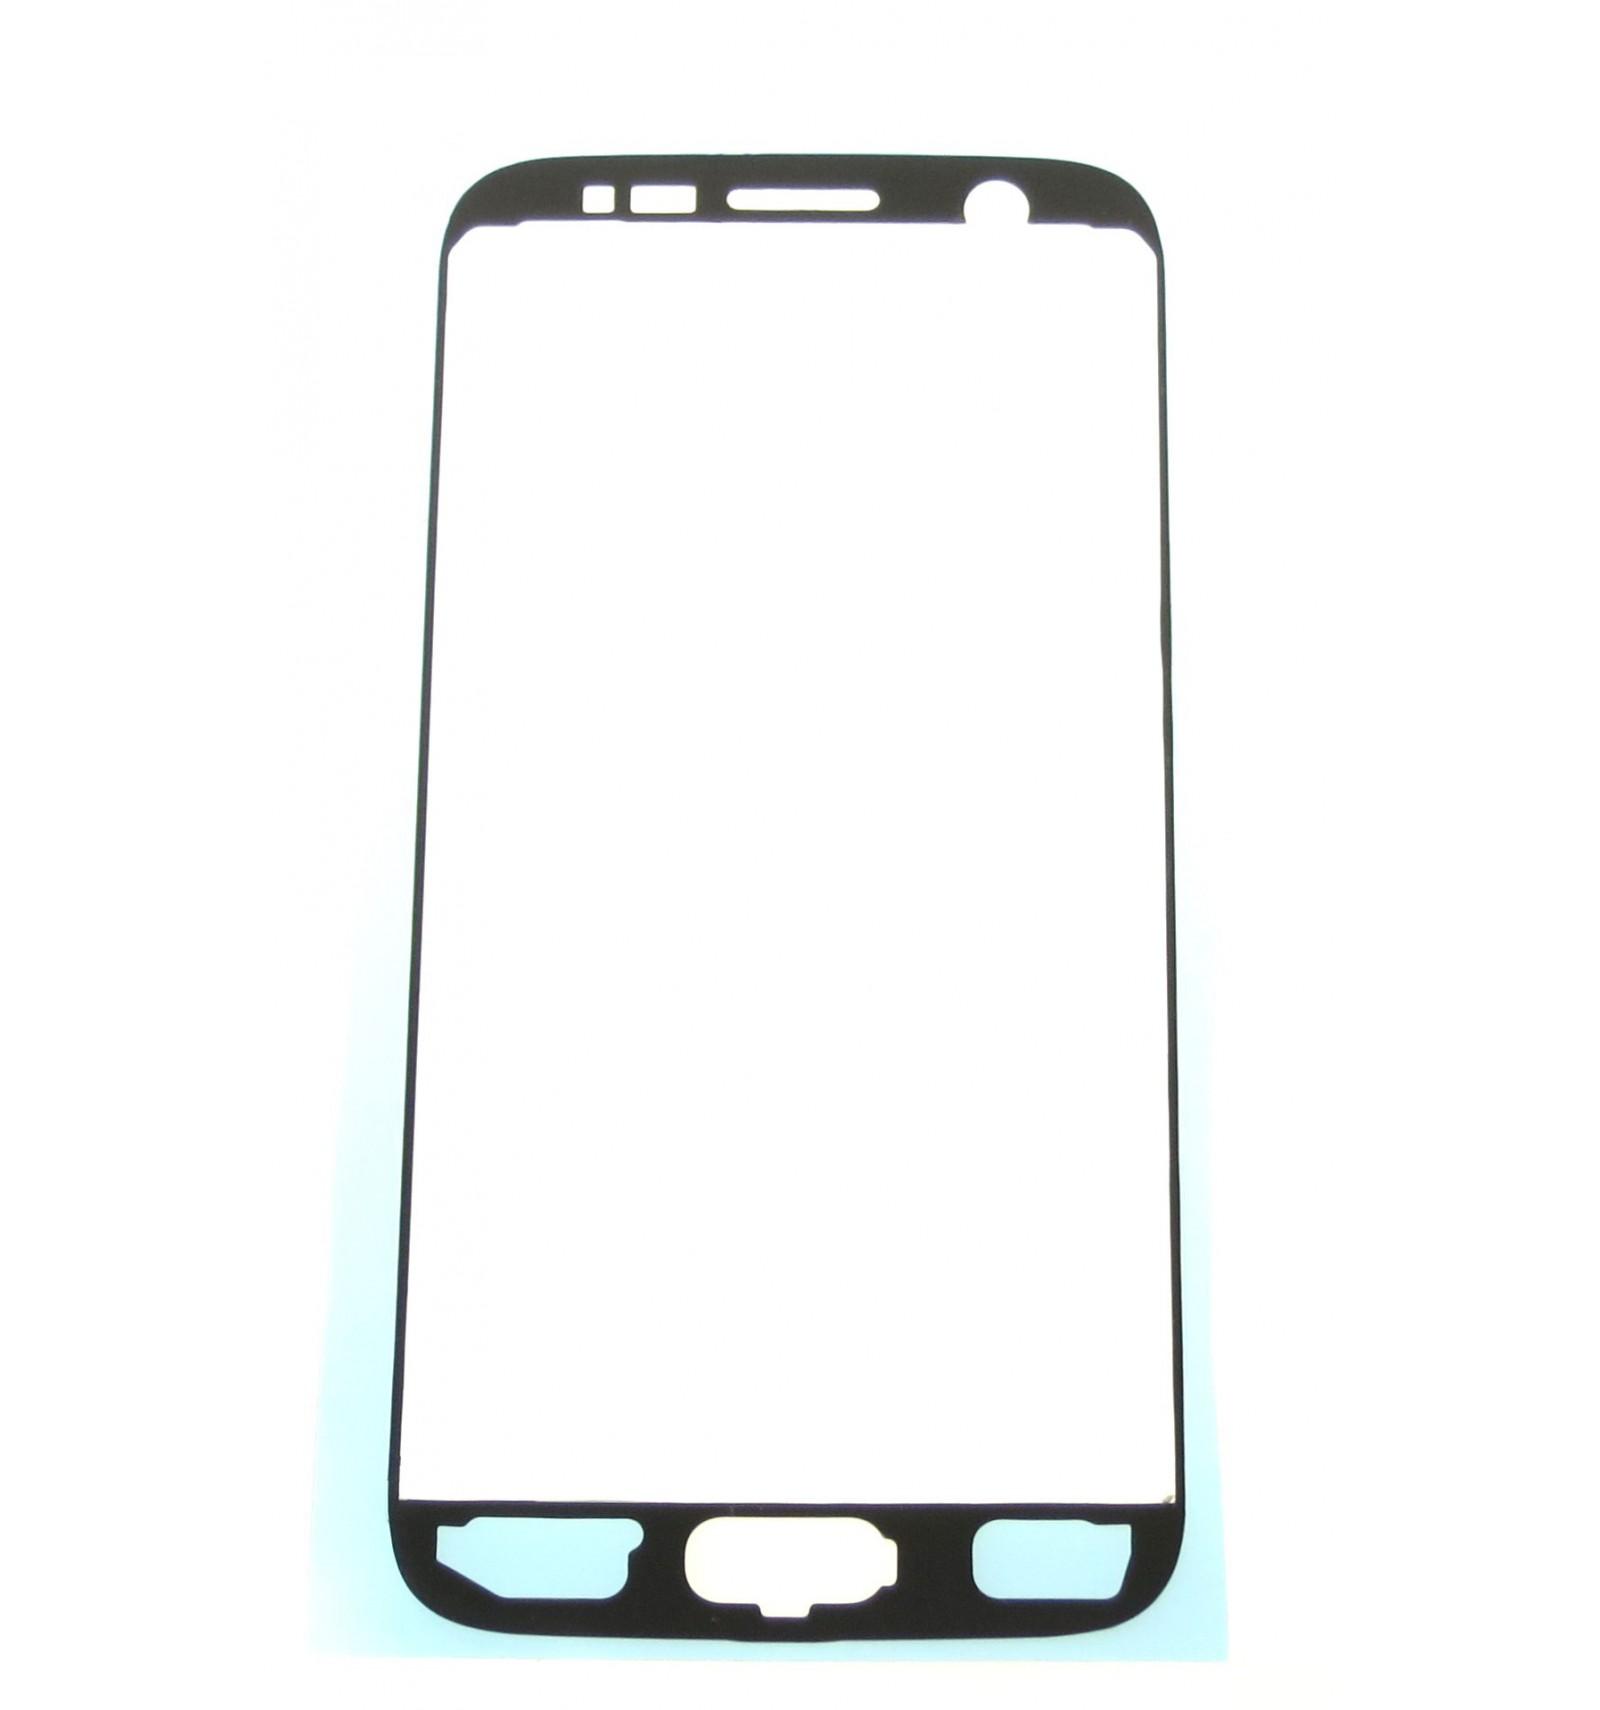 Lepka LCD originál na Samsung Galaxy S7 G930F GH82-11429A